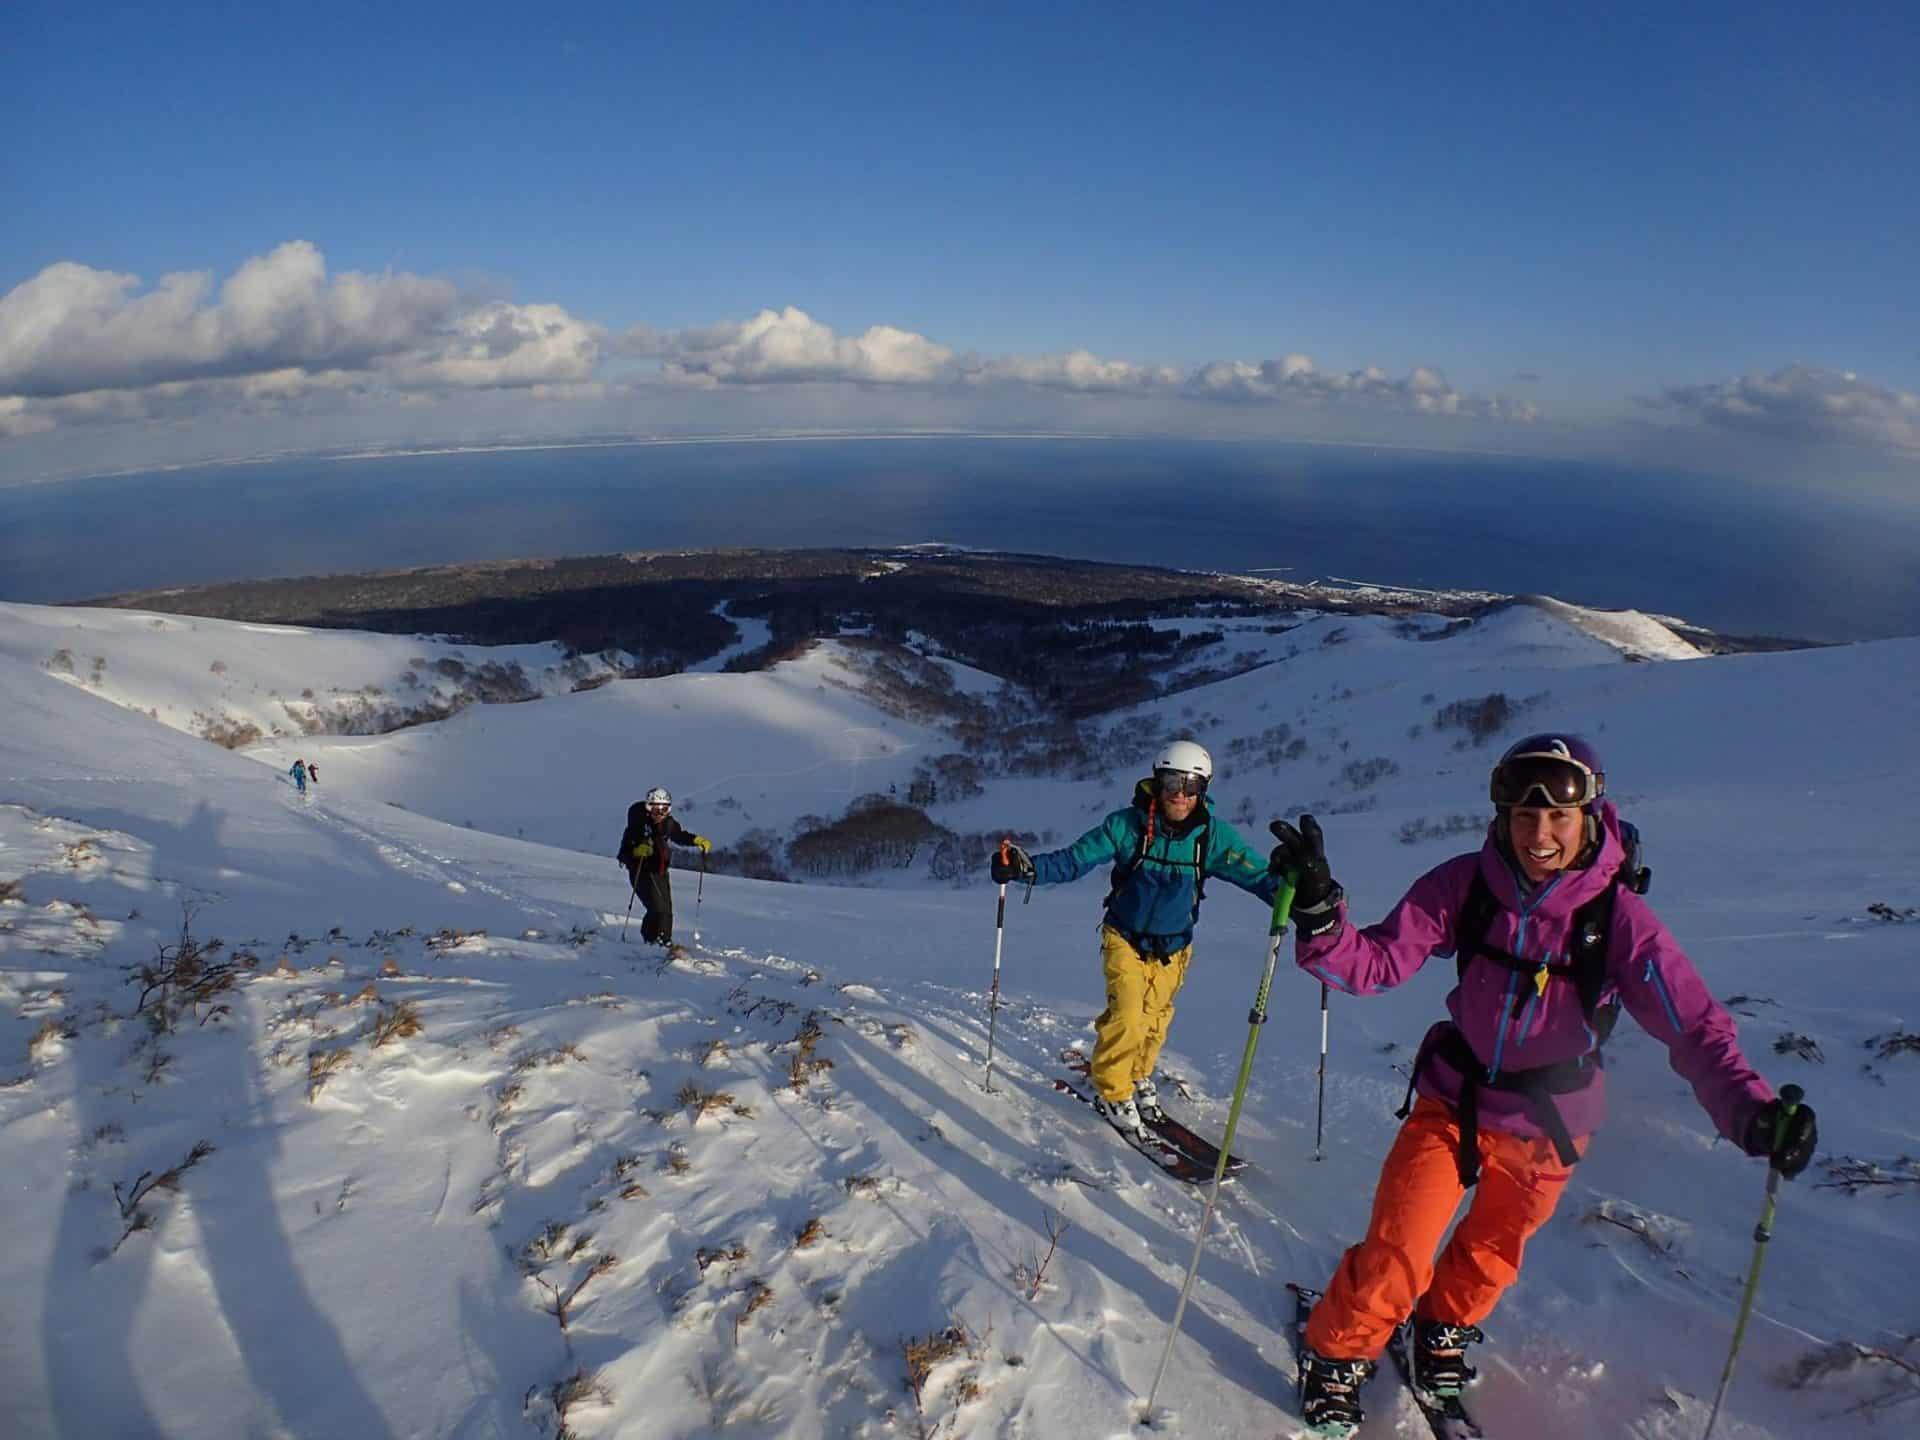 Toshiya Watanabe Jmga Ski Guide 19 Trips Offered